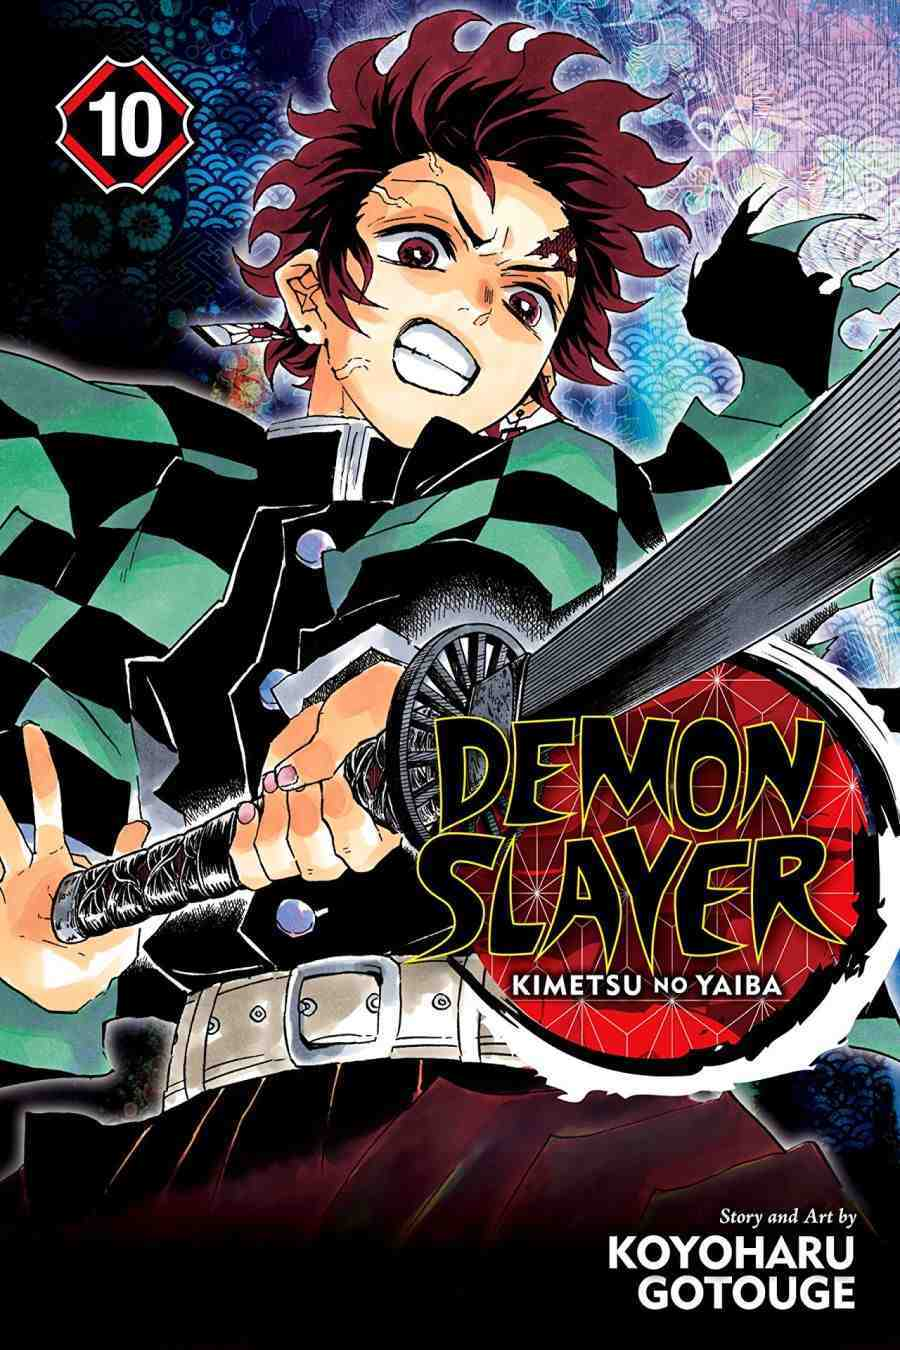 Demon Slayer Kimetsu no Yaiba Vol 10 Human and Demon